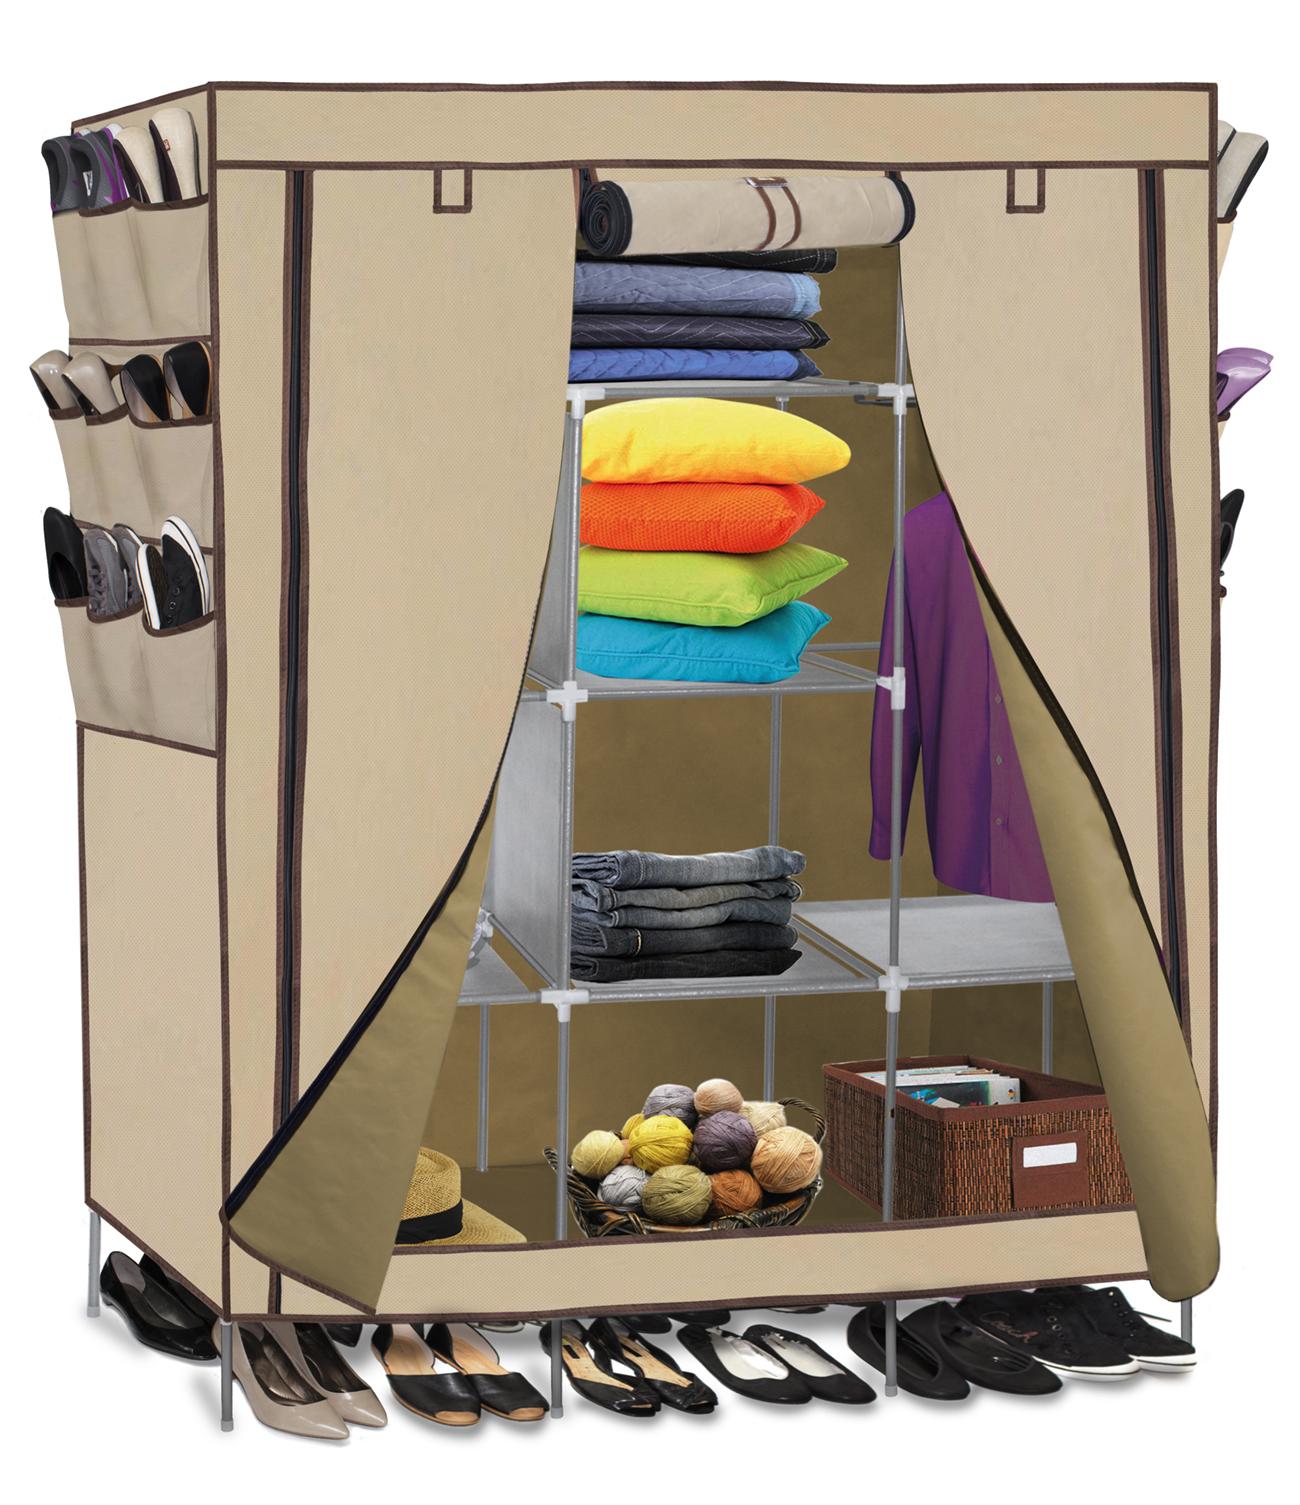 Stylish OxGord Portable Storage Organizer Wardrobe Closet u0026 Shoe Rack, Customizable  Shelves, portable wardrobe closet